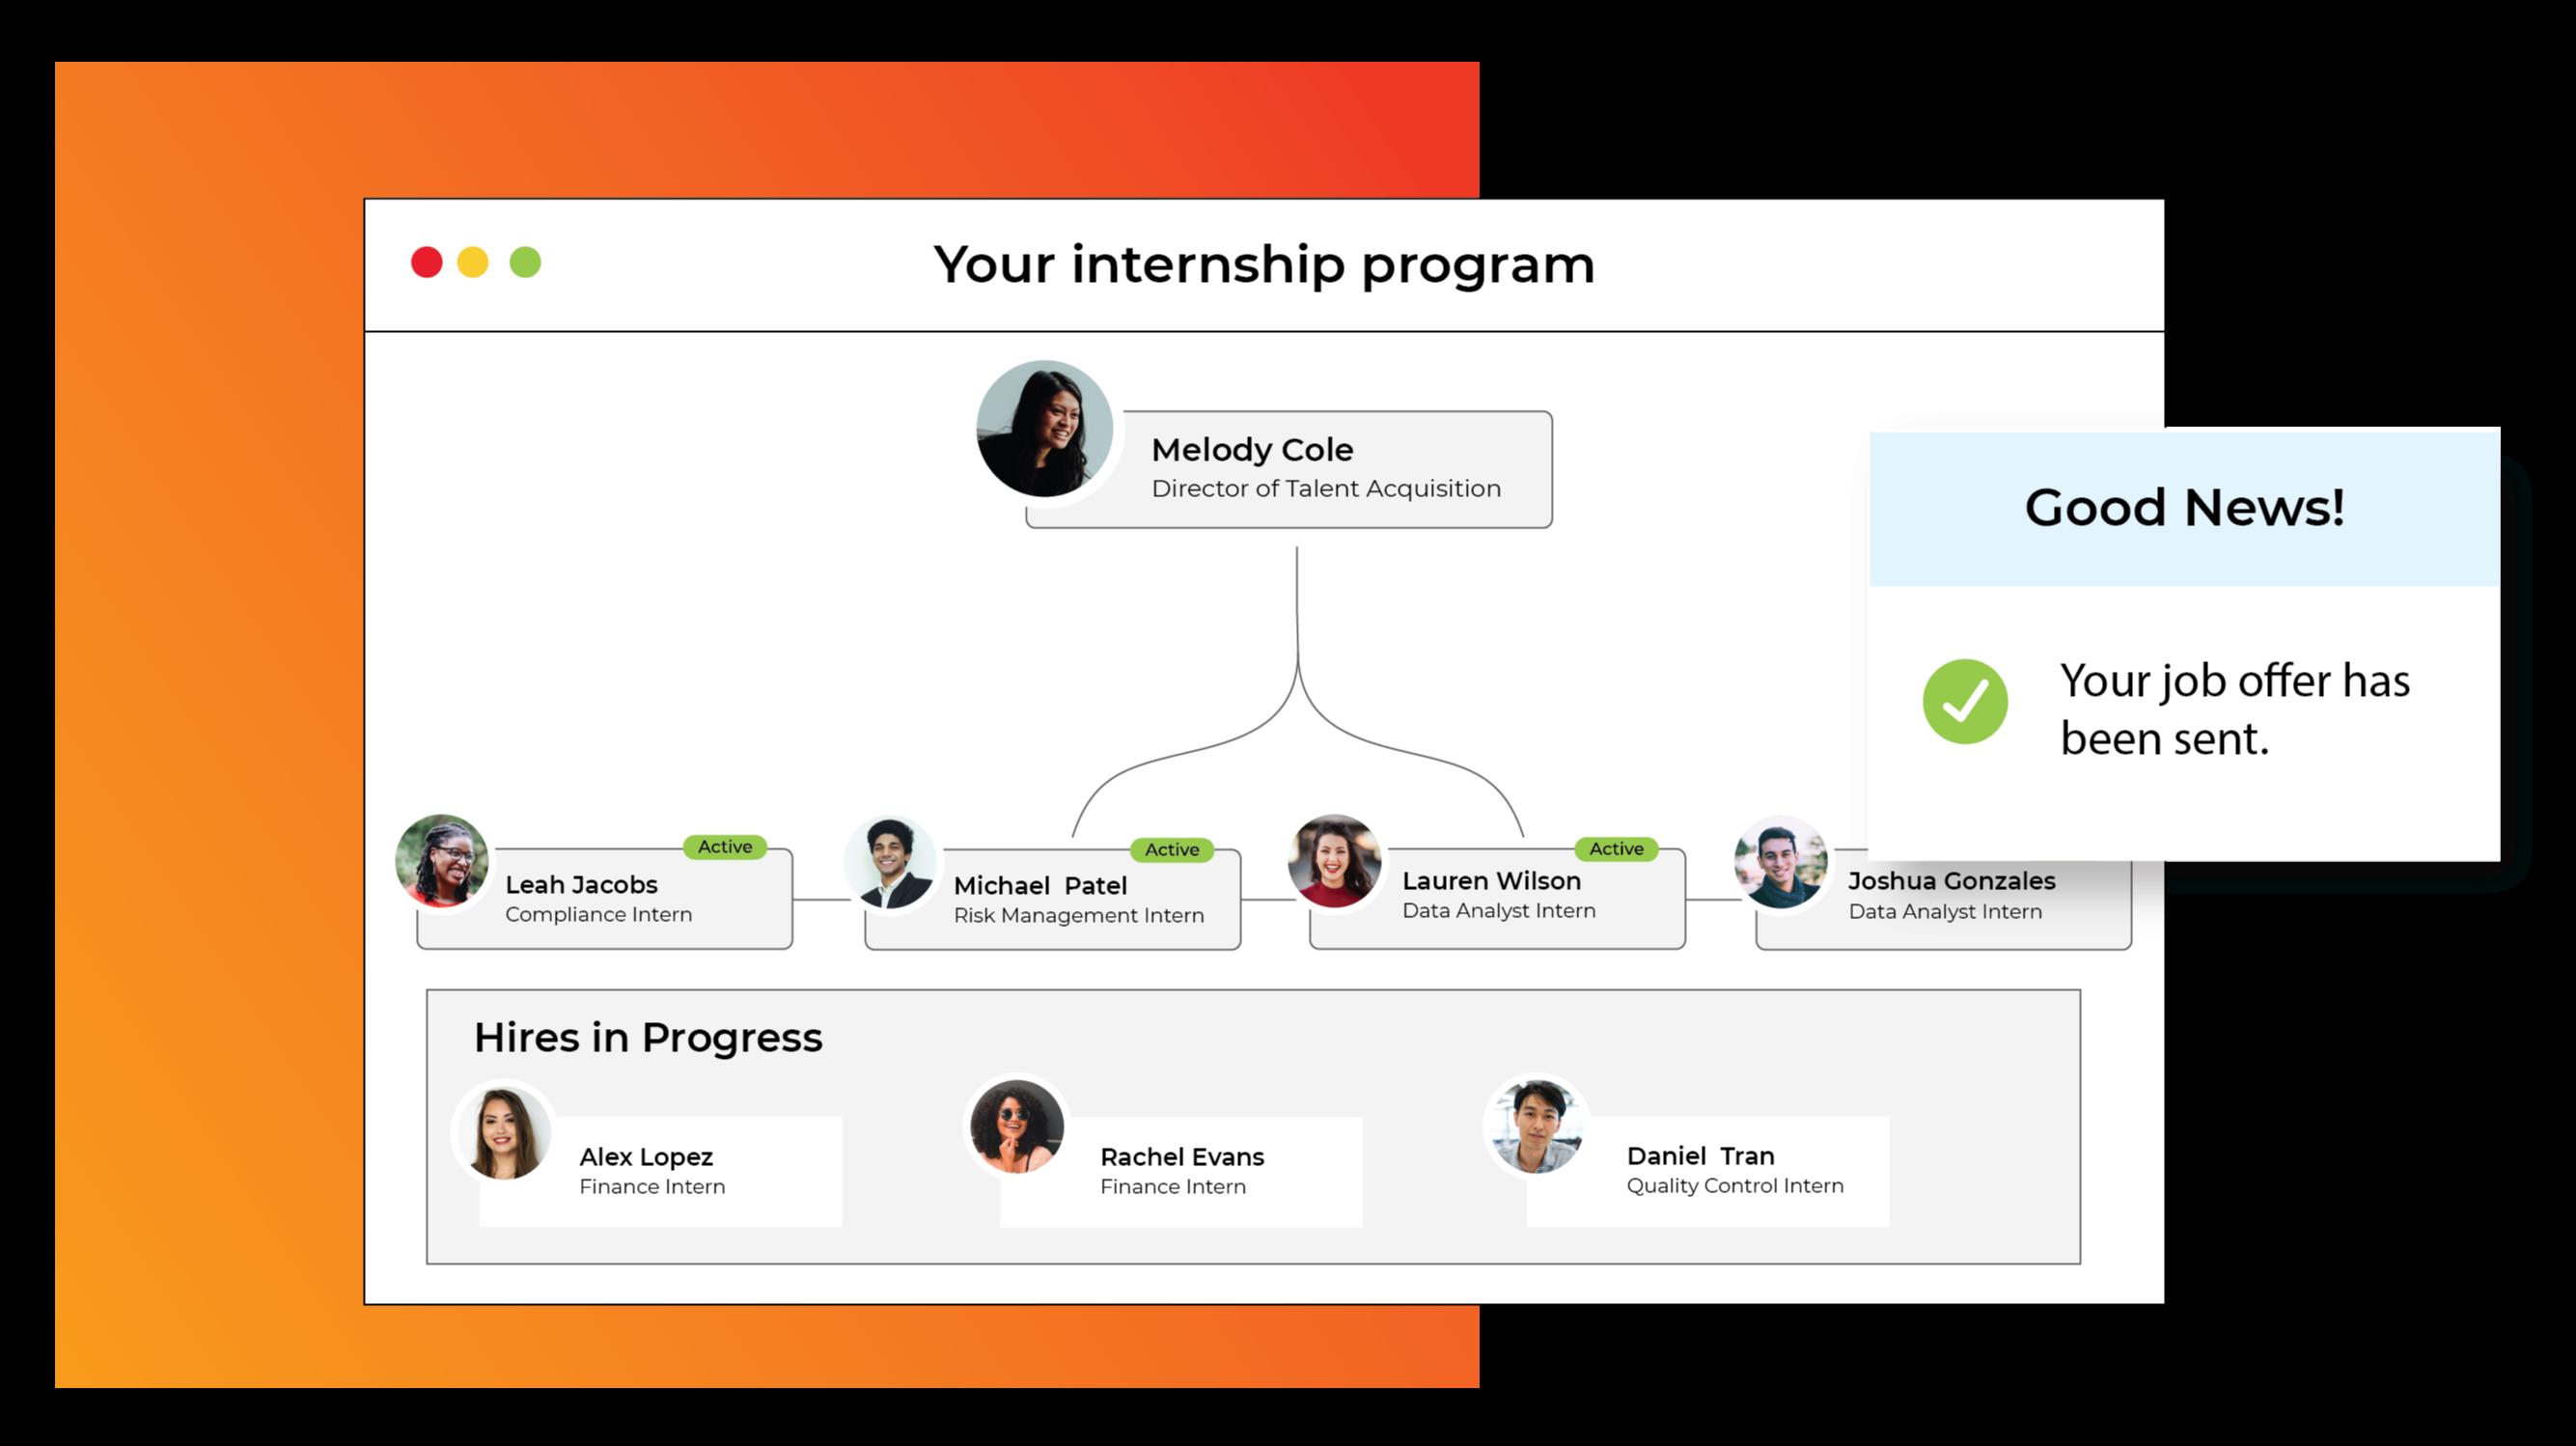 interns-program-1